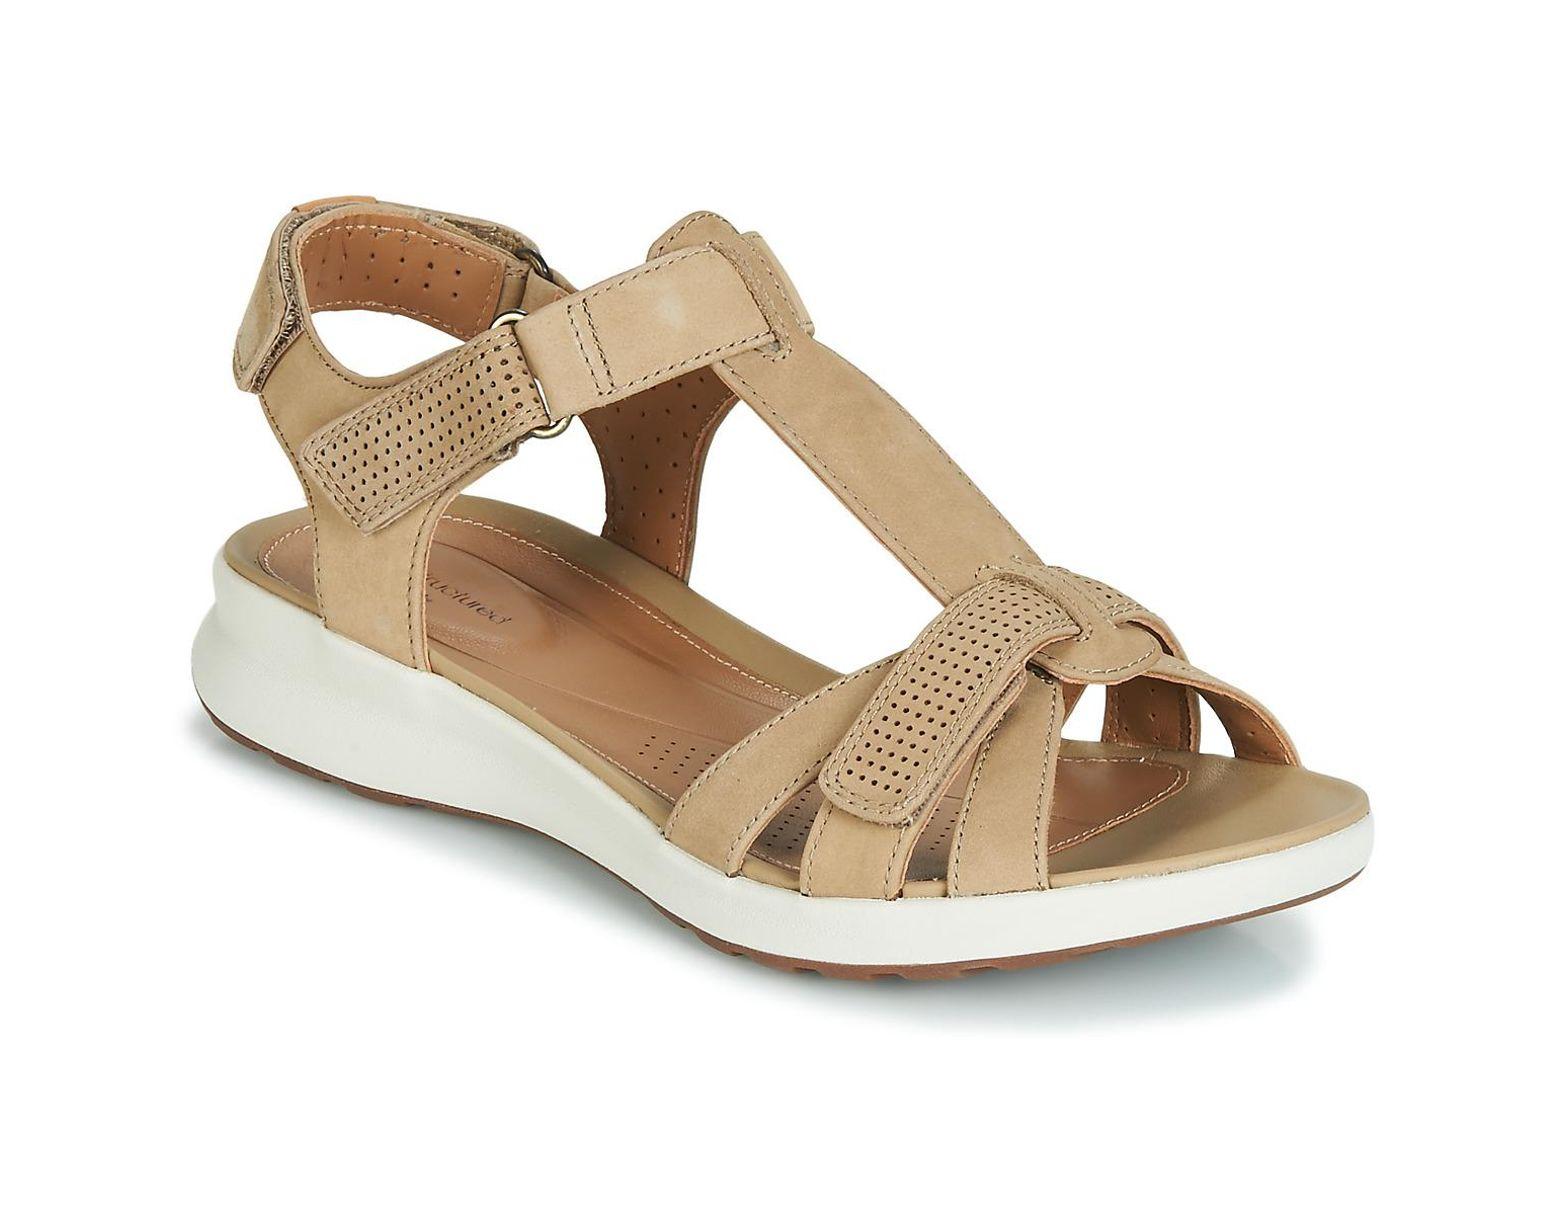 Sandals In Un Natural Women's Adorn Vibe Beige 35L4ARjq